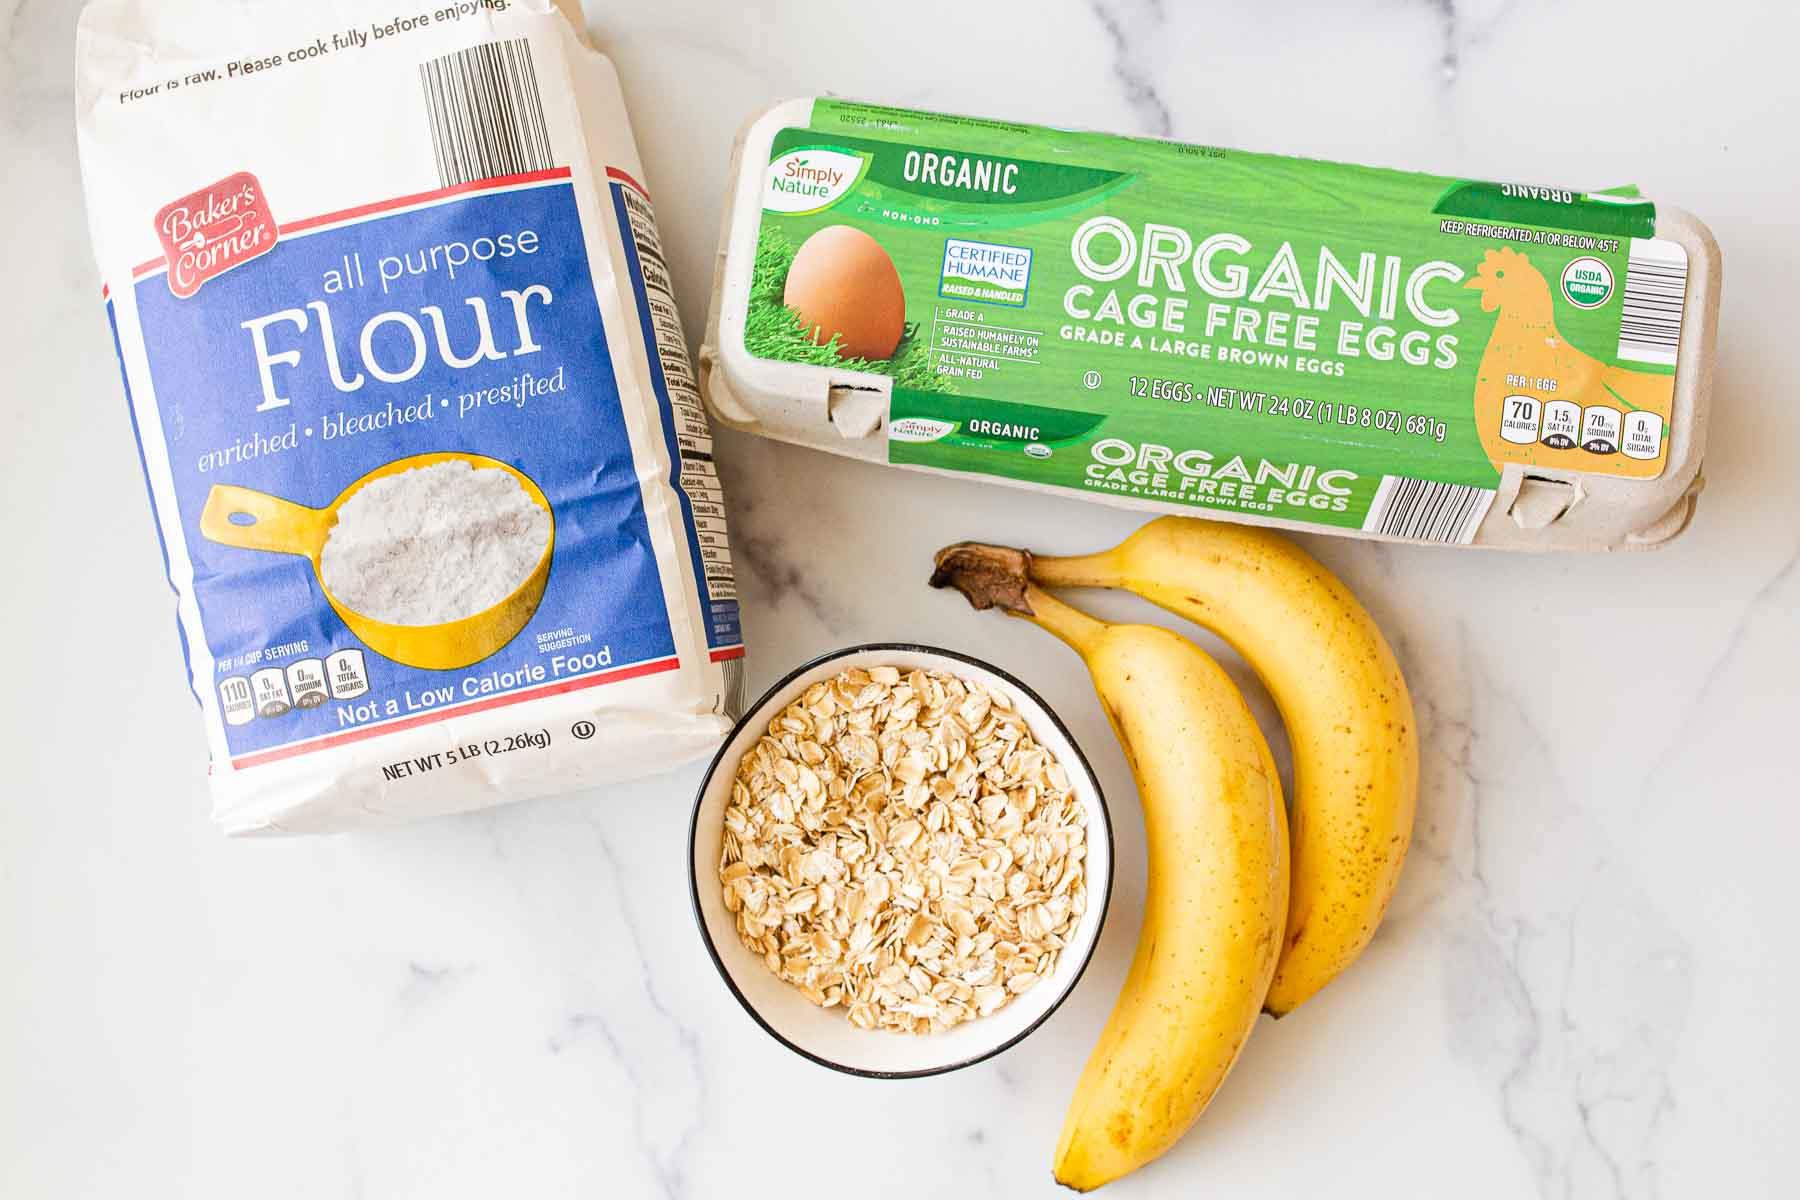 Flour, eggs, banana, and oats on white table.